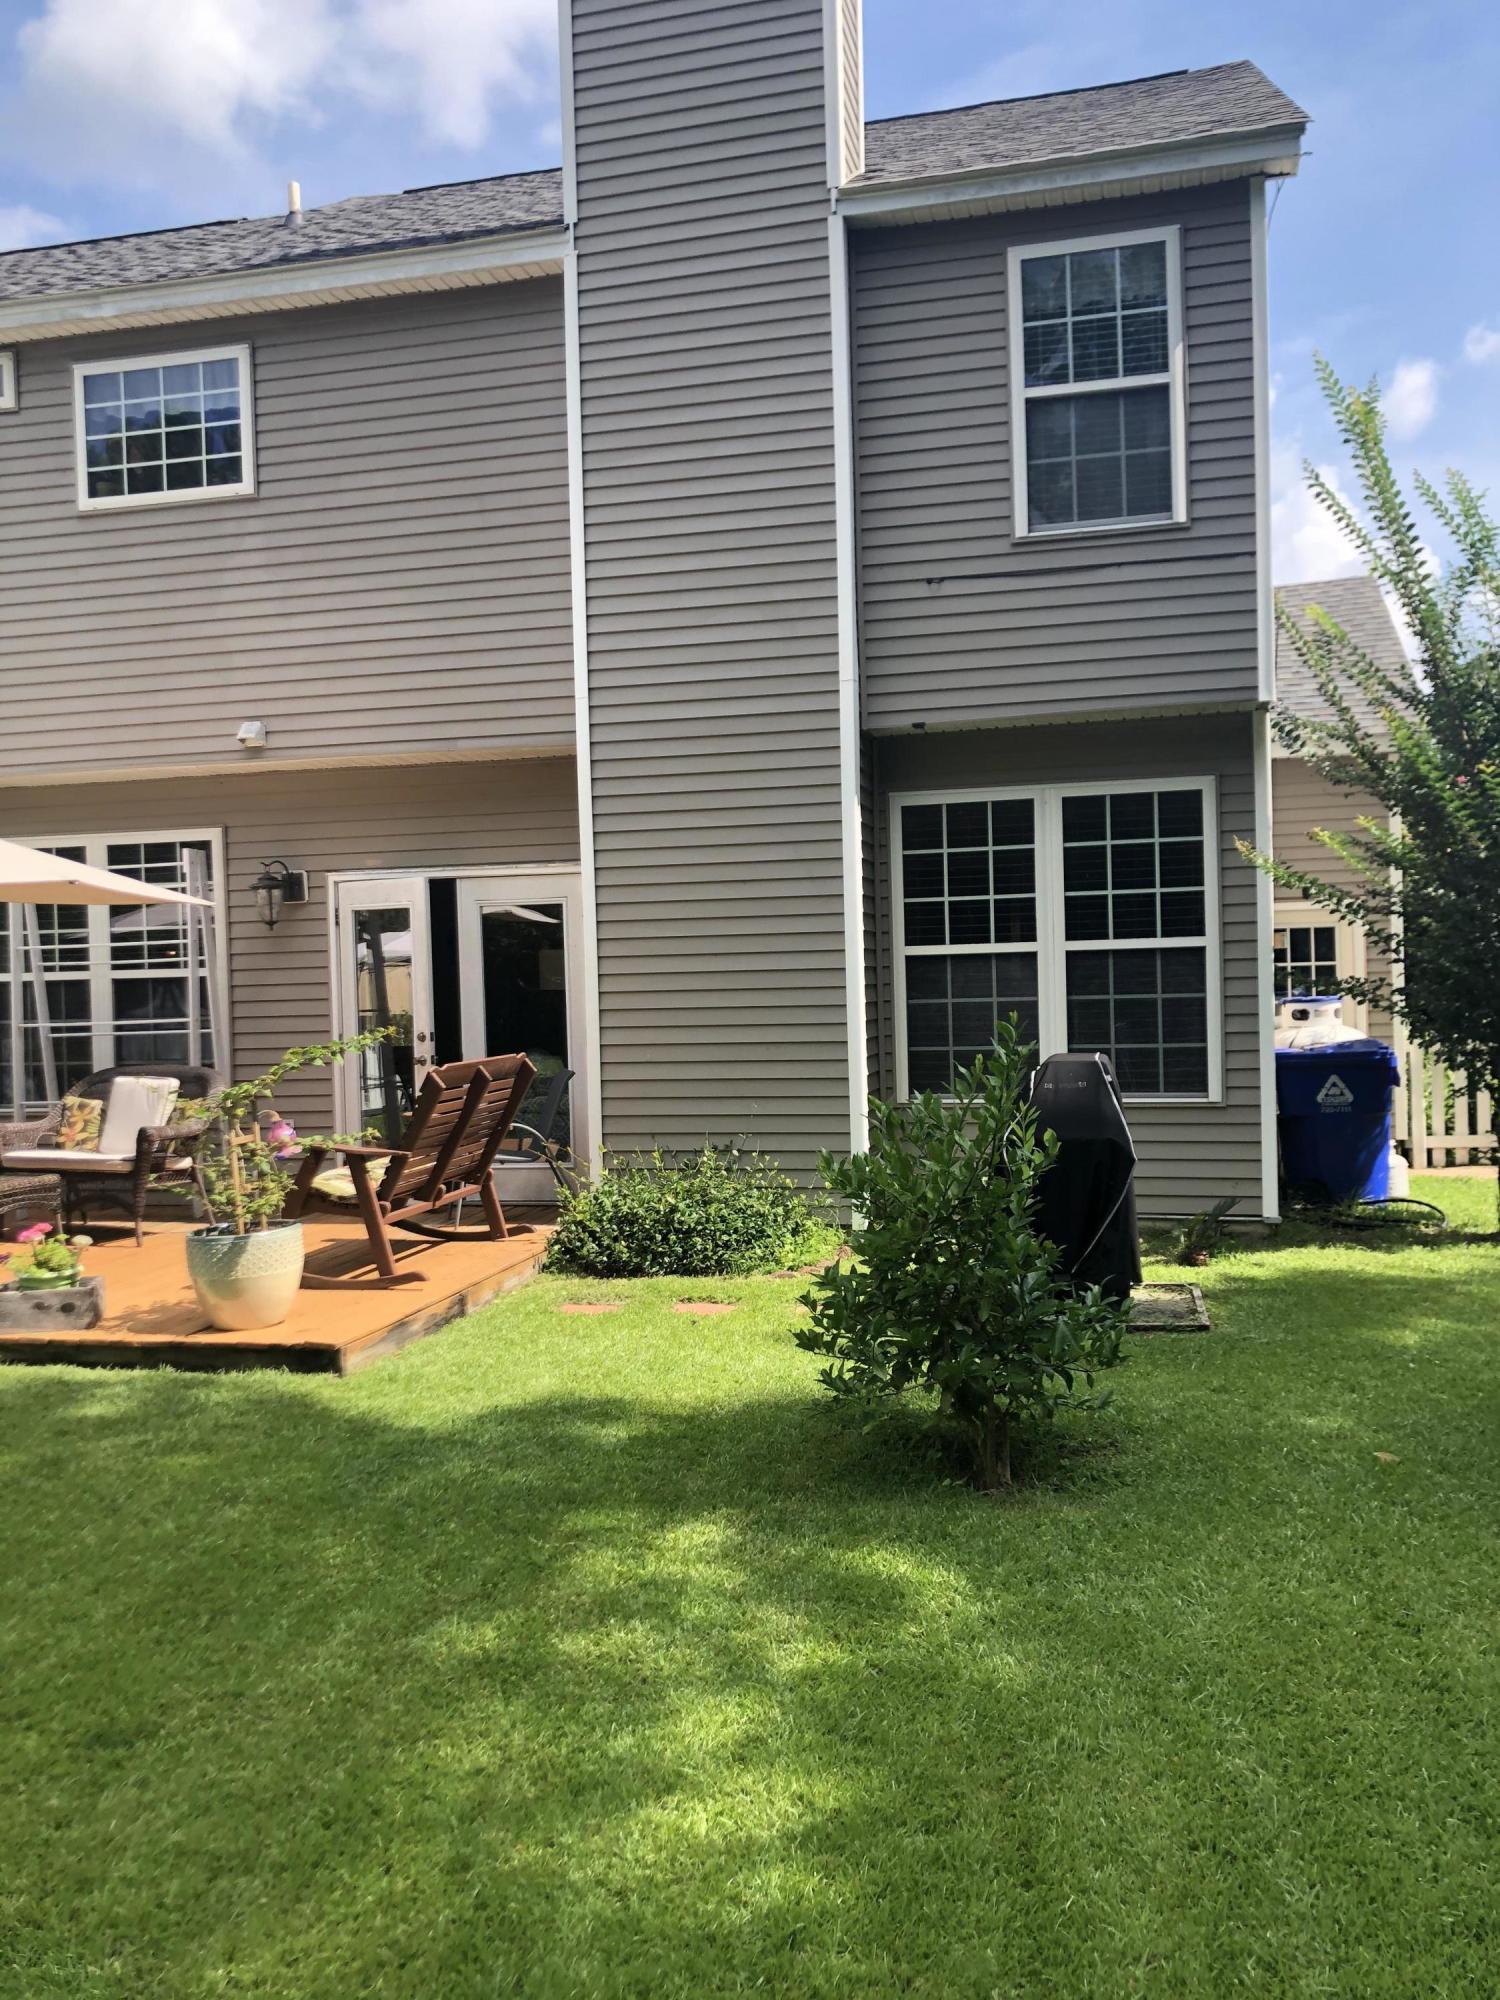 Dunes West Homes For Sale - 1500 Cypress Pointe, Mount Pleasant, SC - 9